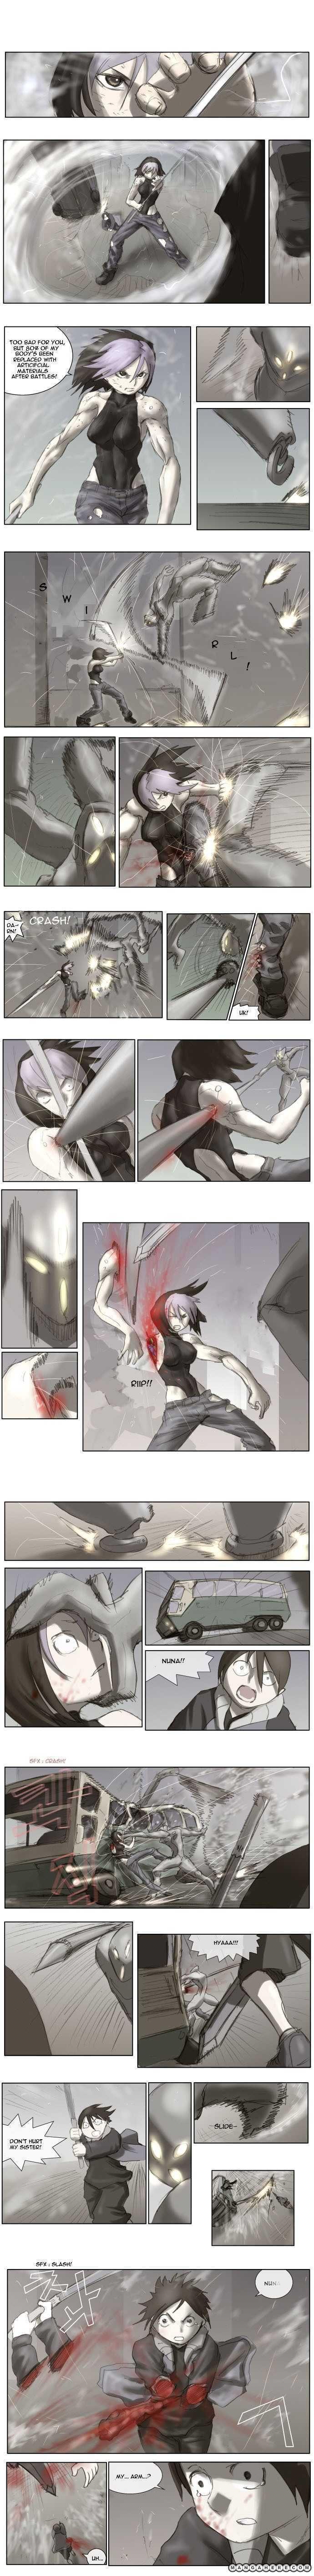 Knight Run 12 Page 2